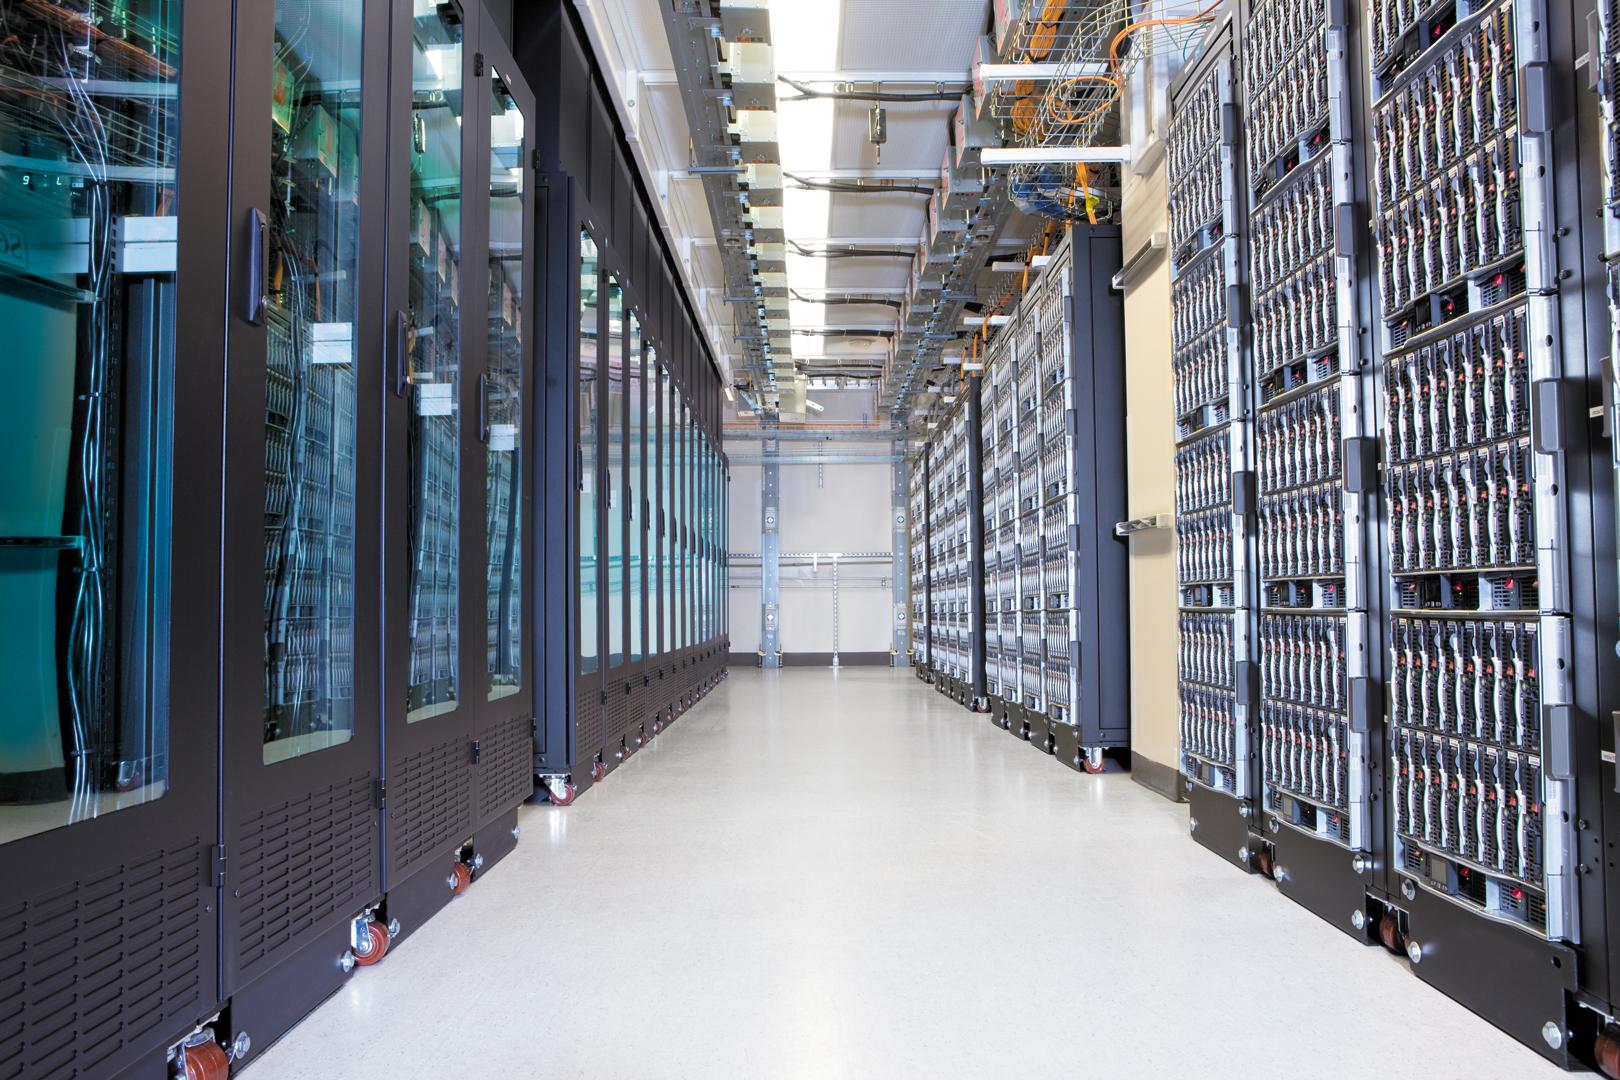 33042_Rack-server-aisle_8273_5400.jpg